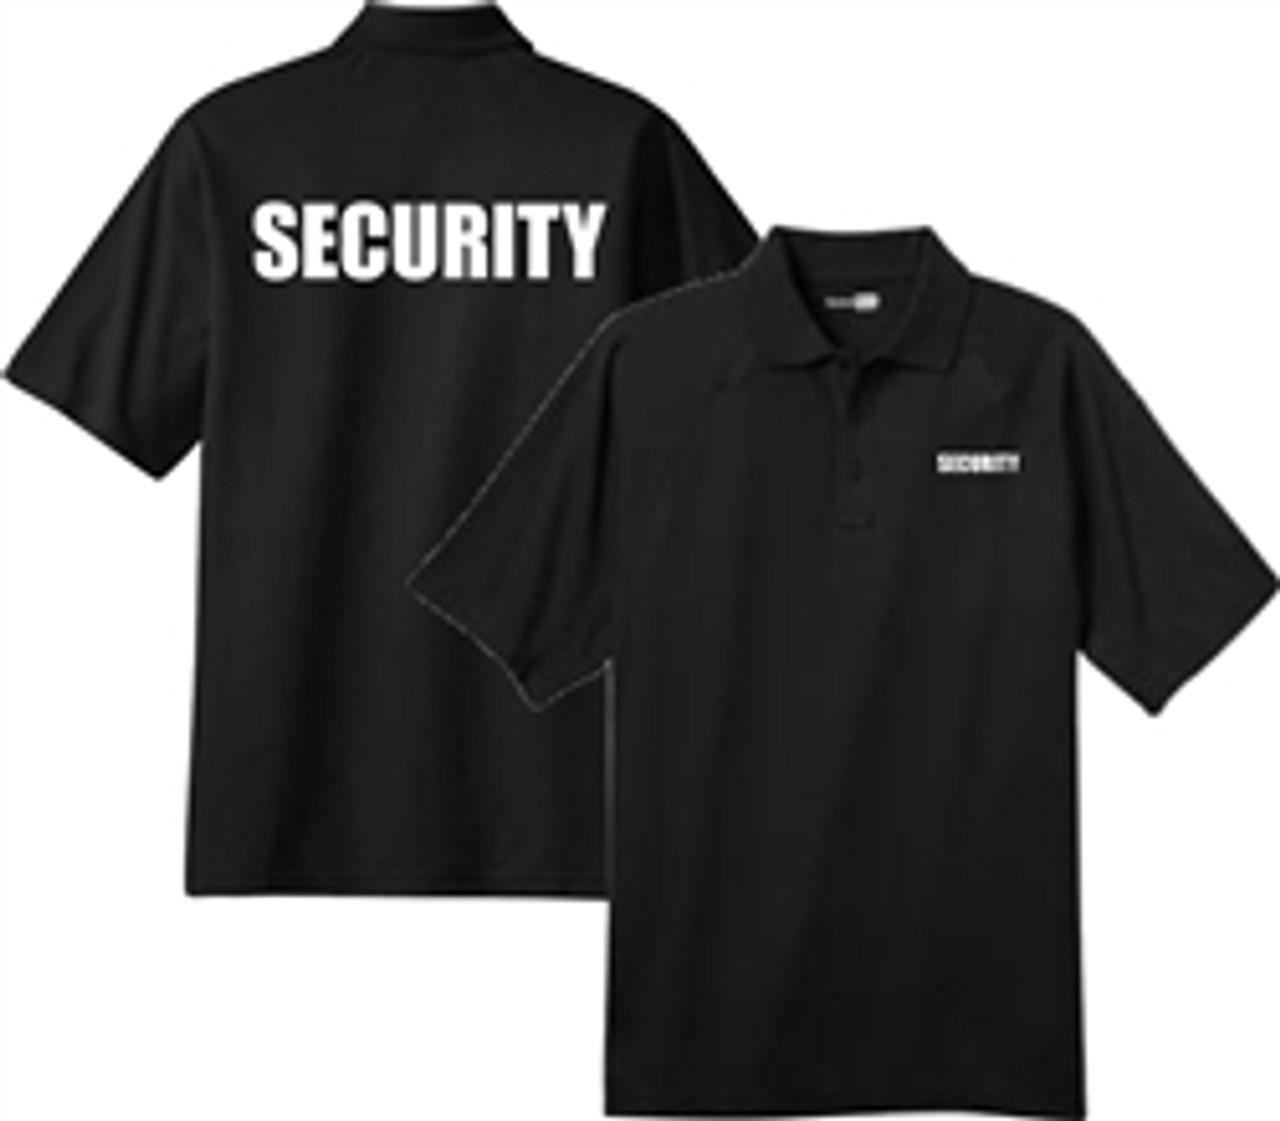 Security - Black Short Sleeve Tactical Polo